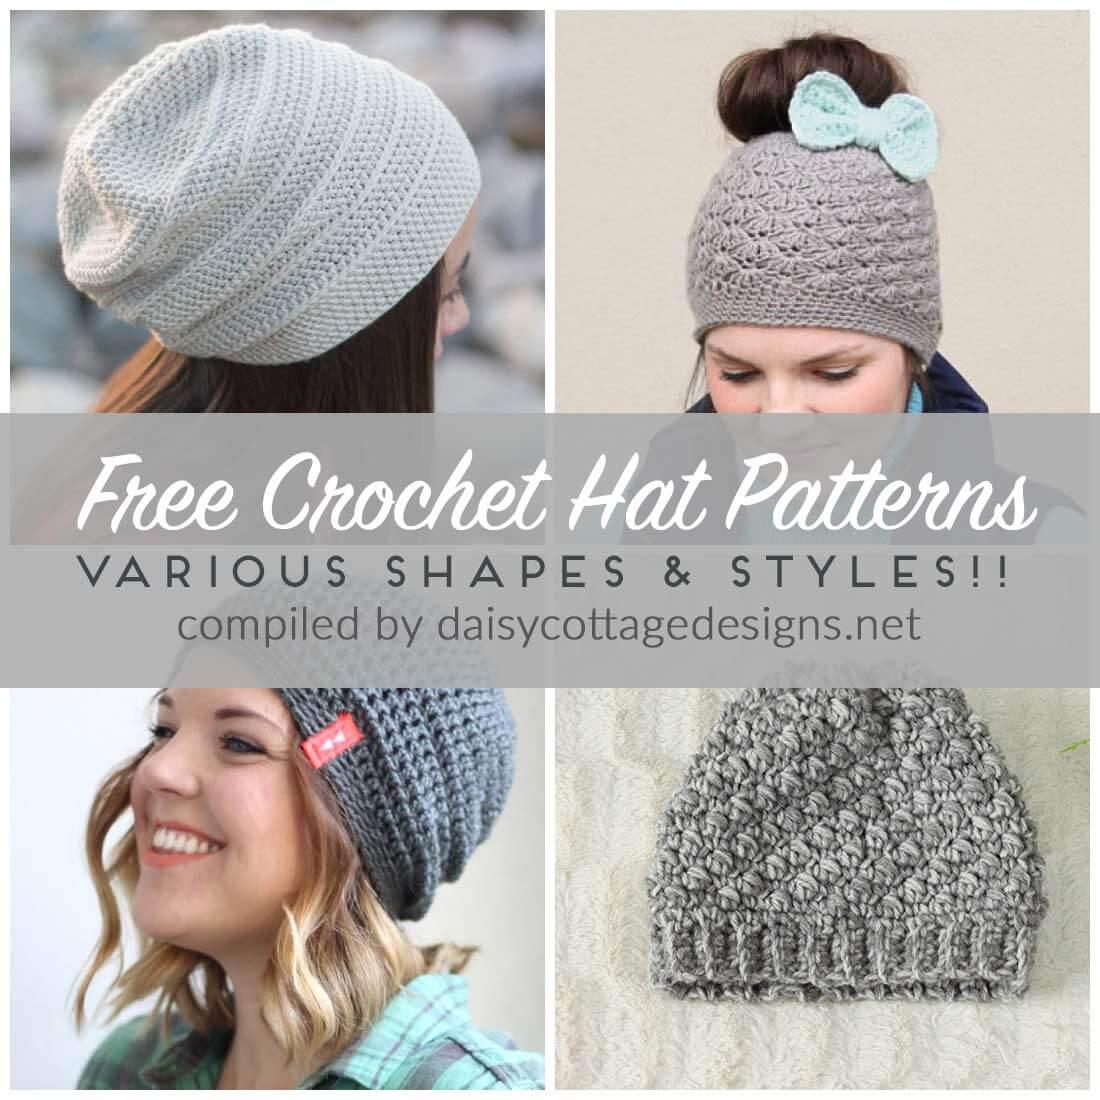 free crochet hat patterns   free crochet patterns   crochet patterns   use auzvlum